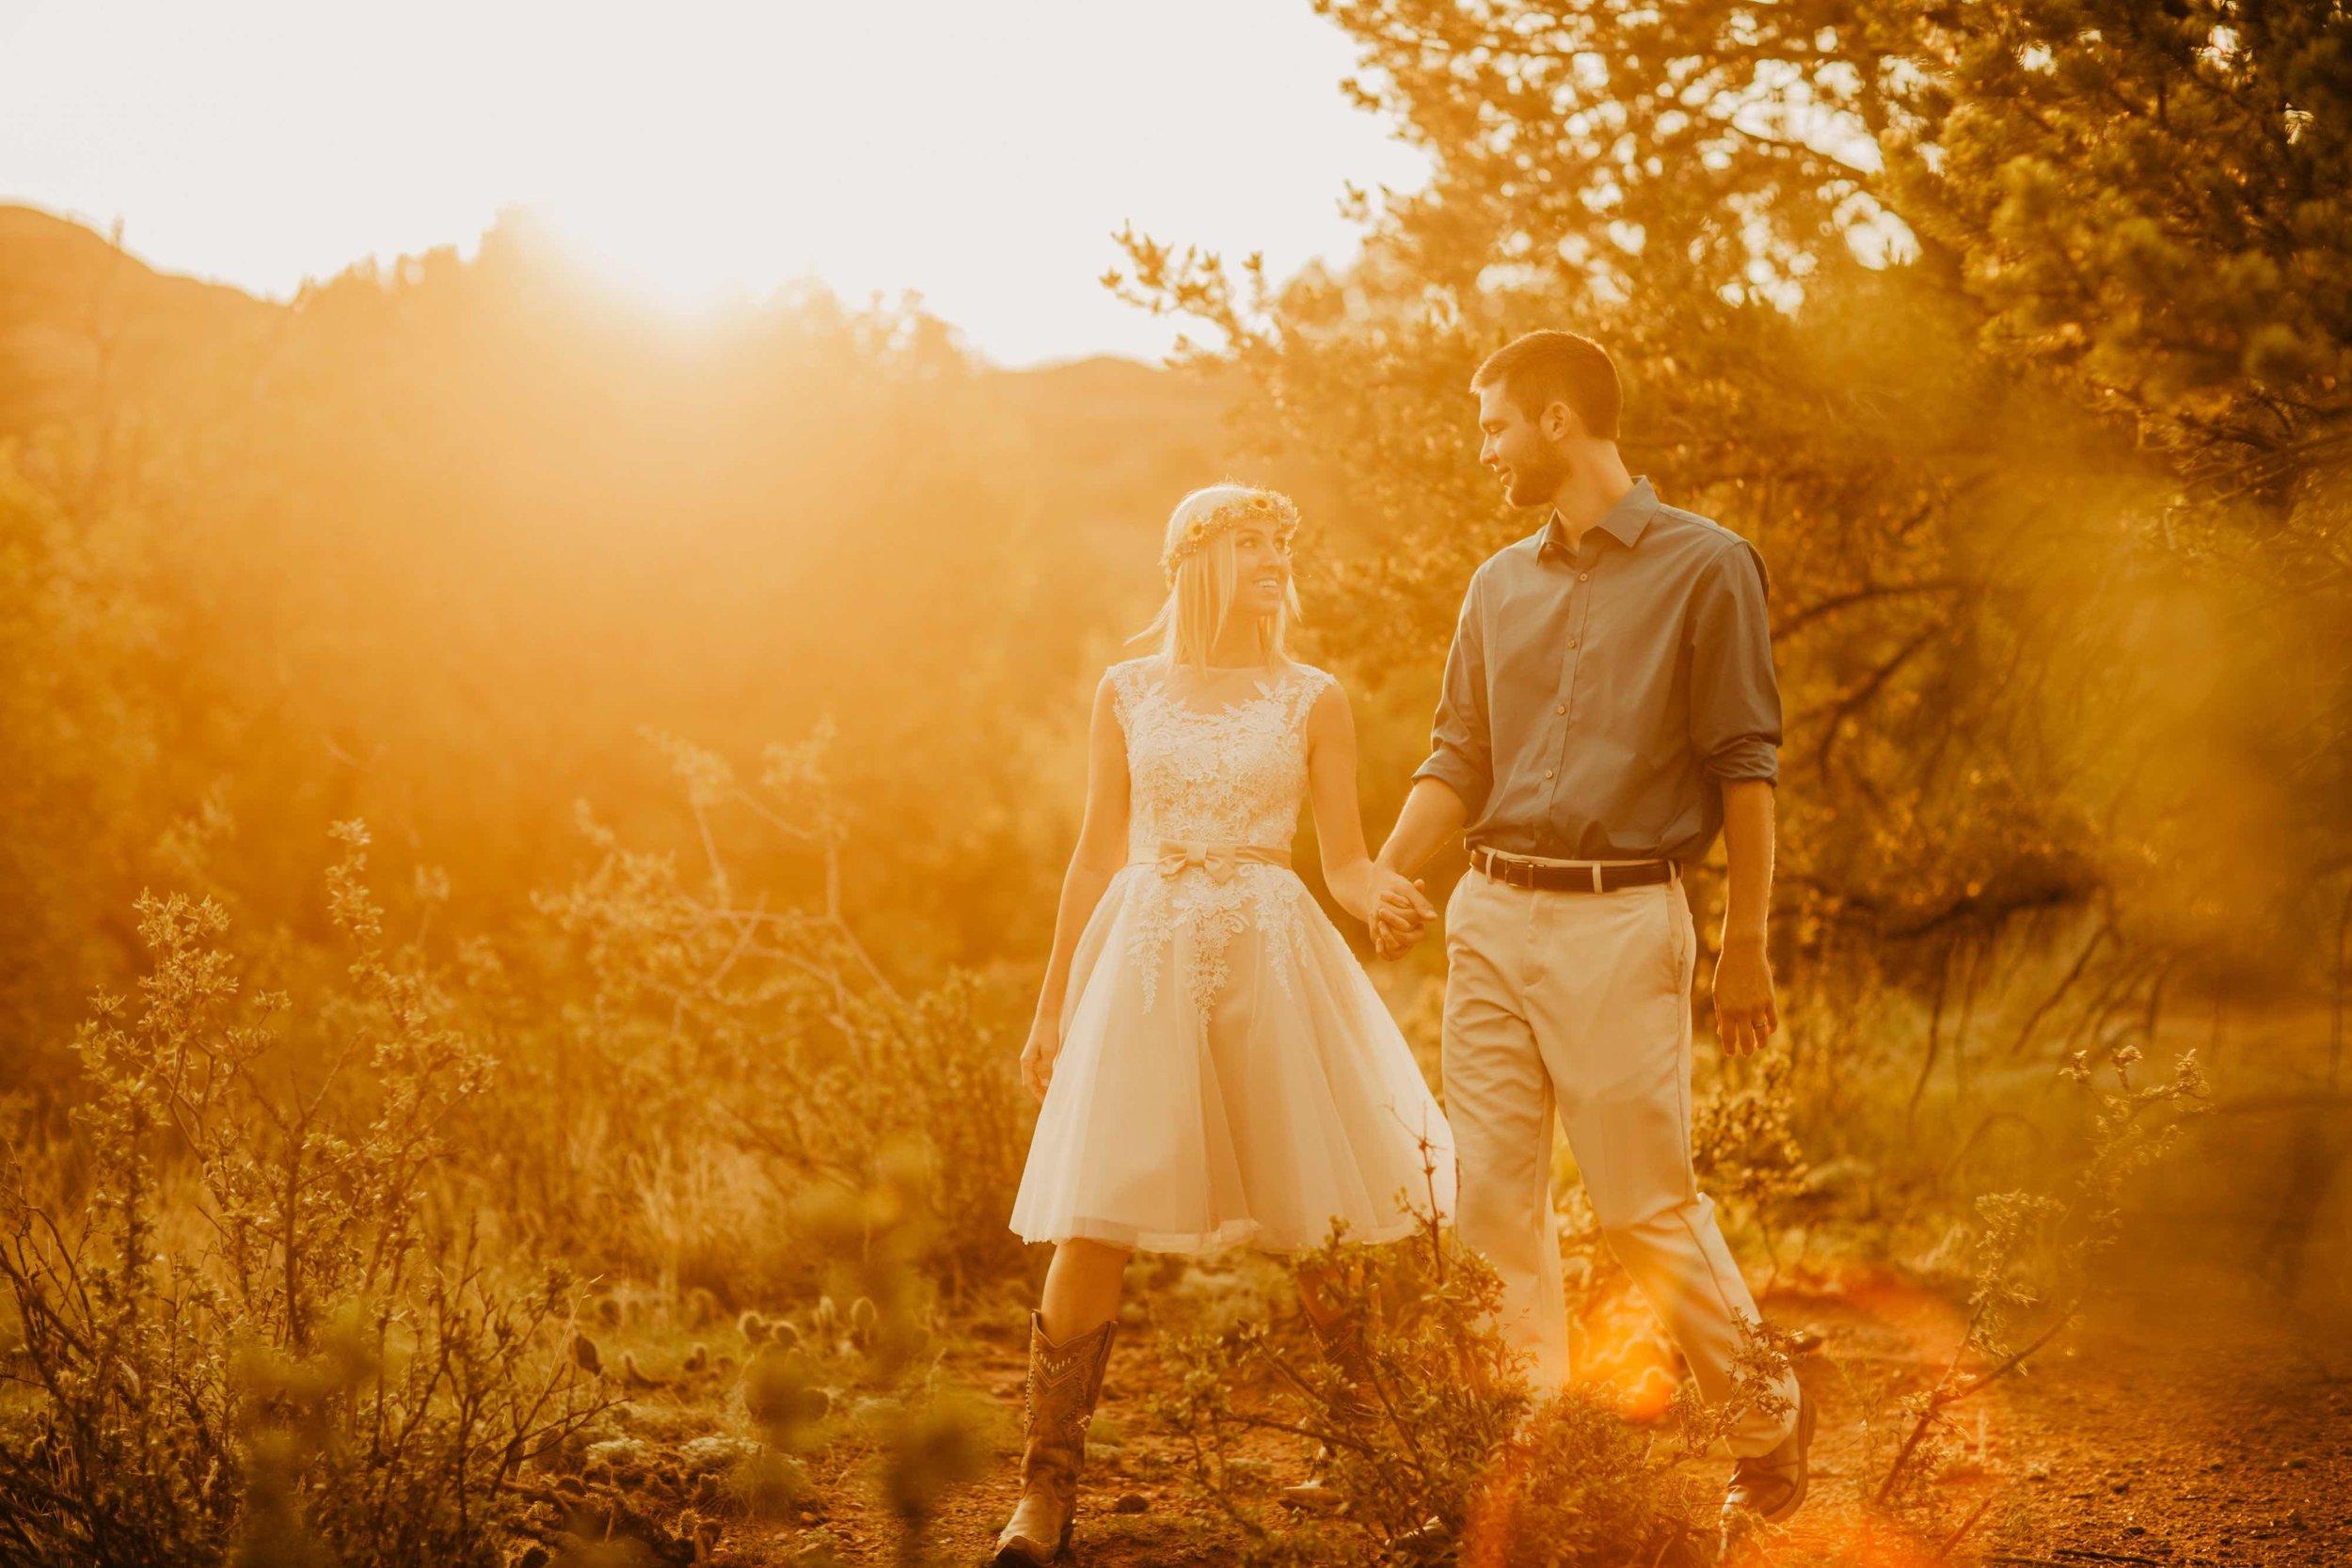 Kisa Conrad Favorites-0016-colorado-wedding-photographer-denver-springs-vail.jpeg